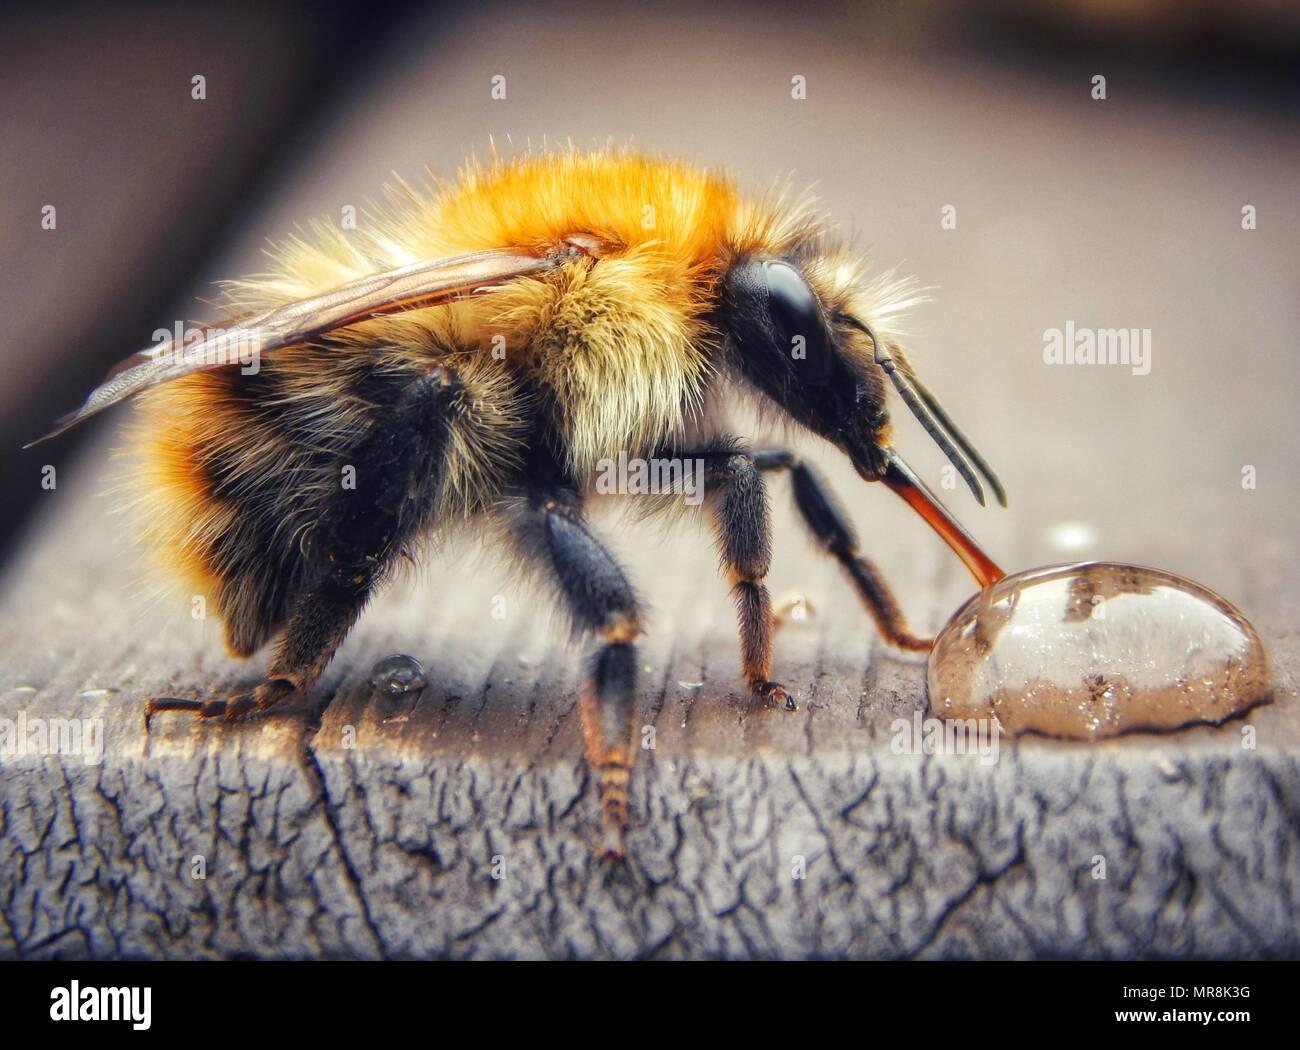 Carda de abeja común beber una gota de agua con azúcar cerrar Imagen De Stock